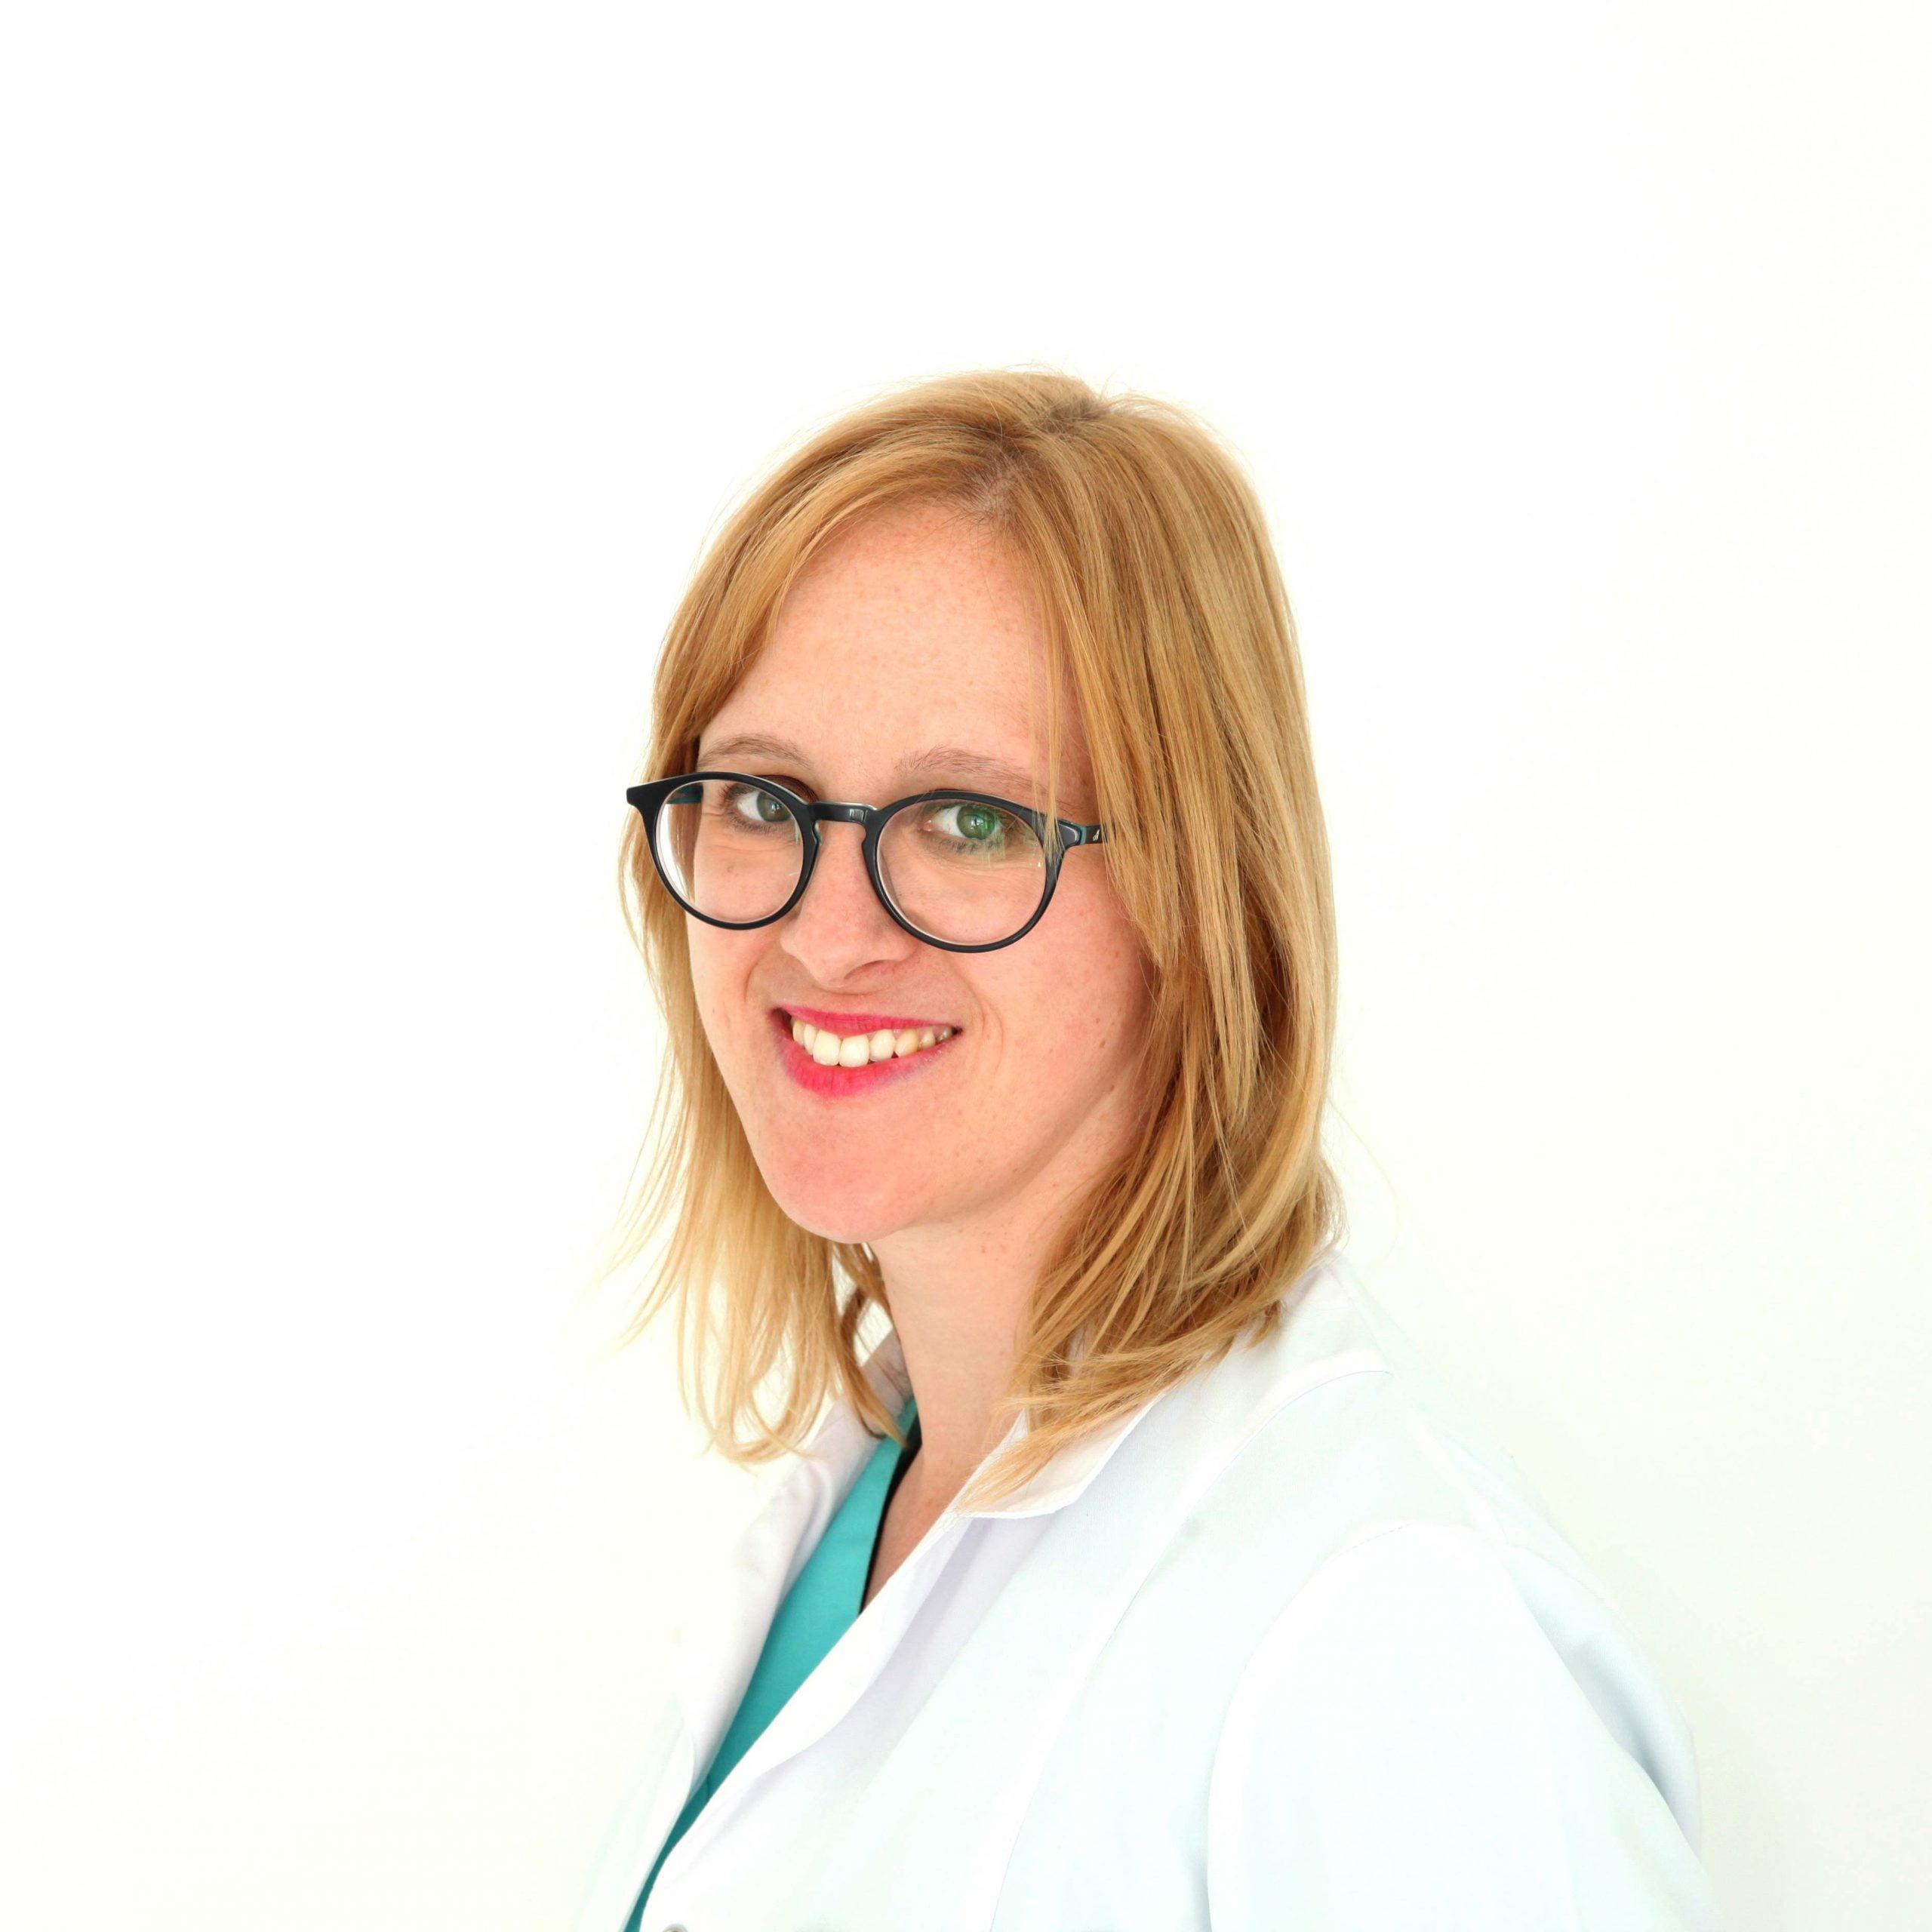 Dra. Katharina Spies